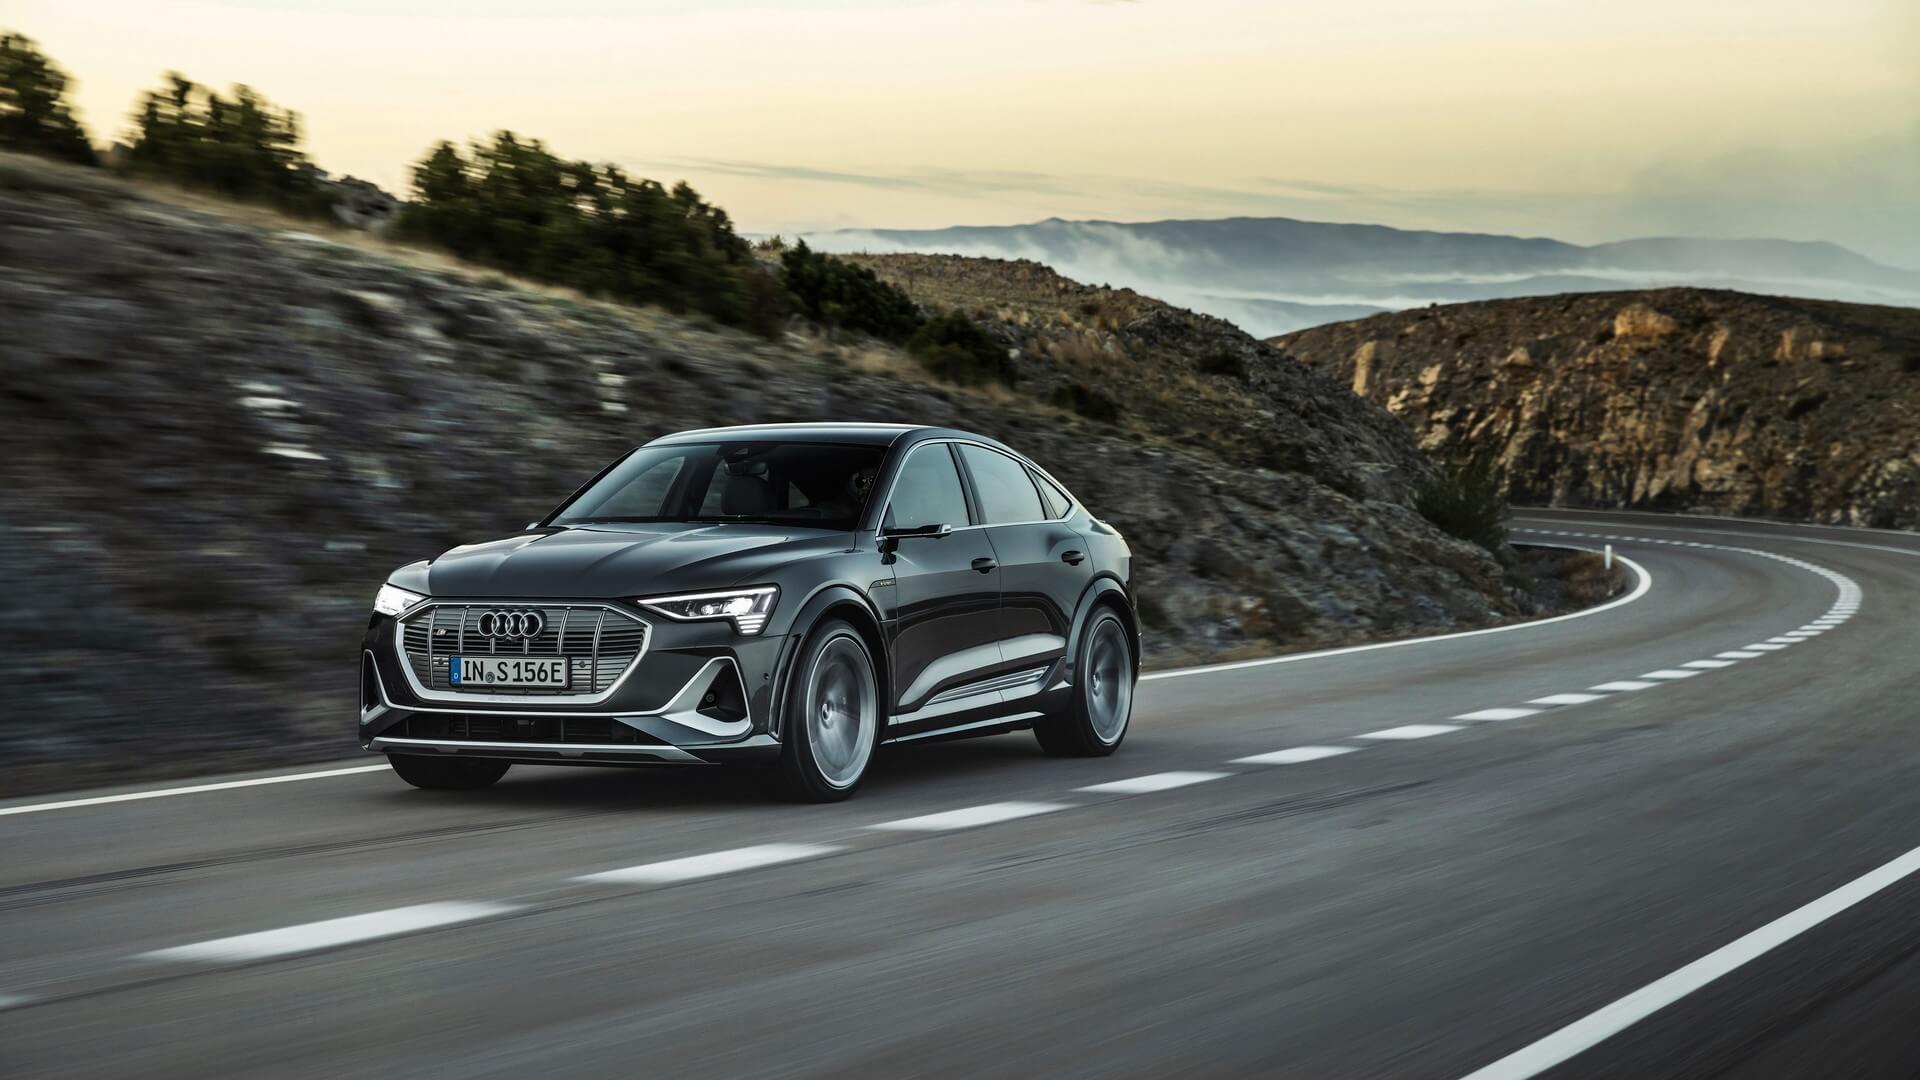 Audi-E-Tron-S-and-E-Tron-S-Sportback-2020-42